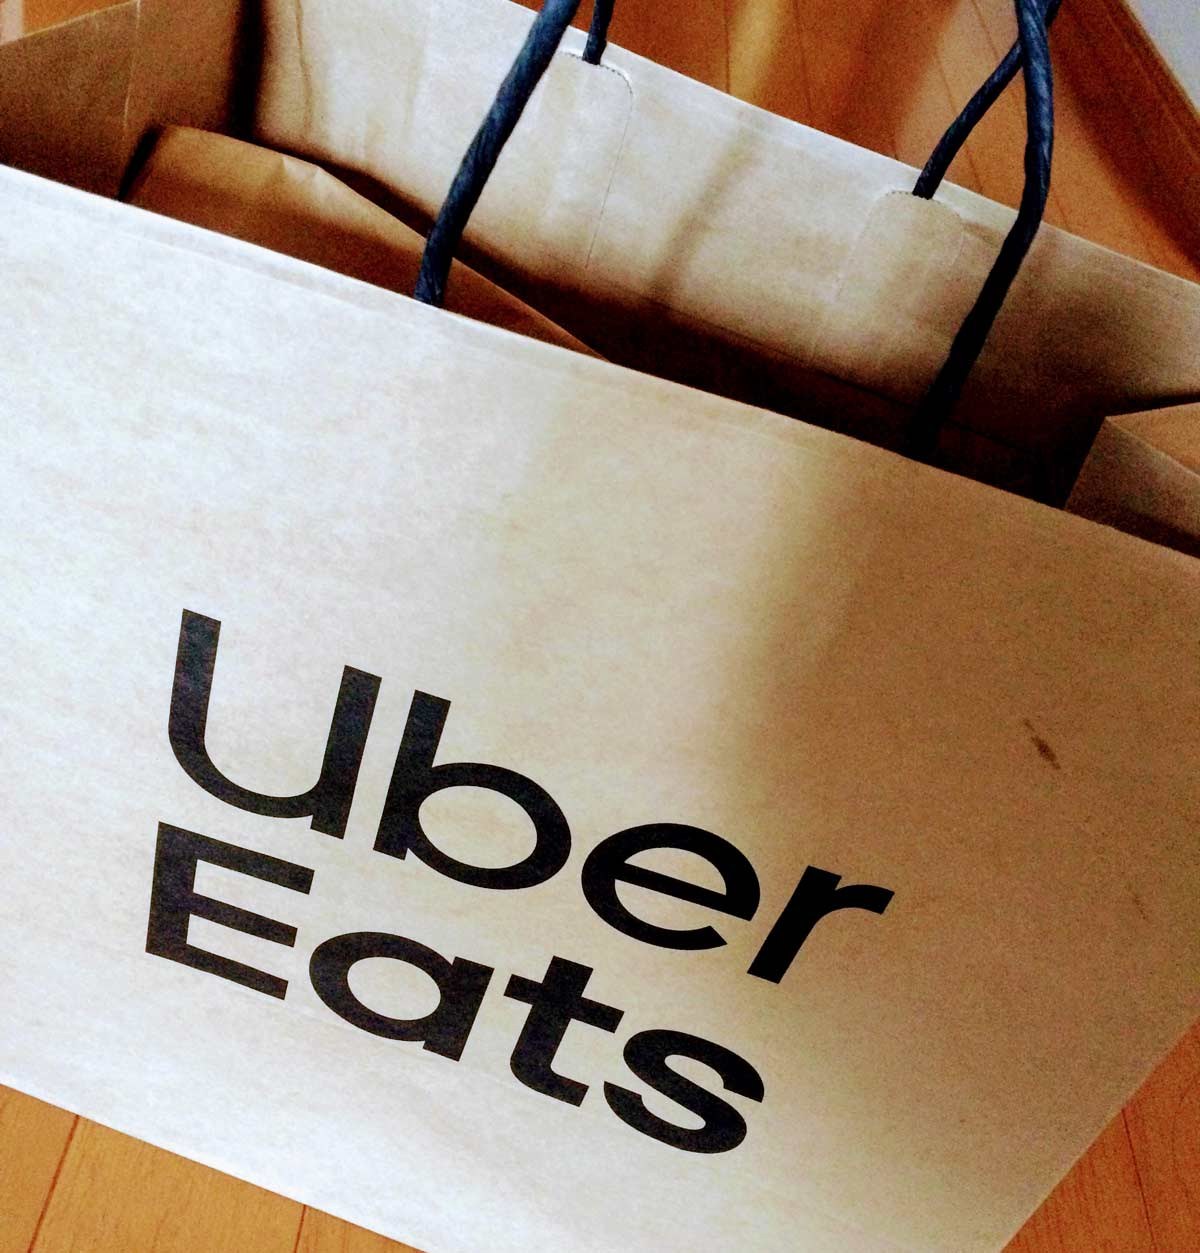 Uber Eatsで配達にかかる時間、登録するカードなど